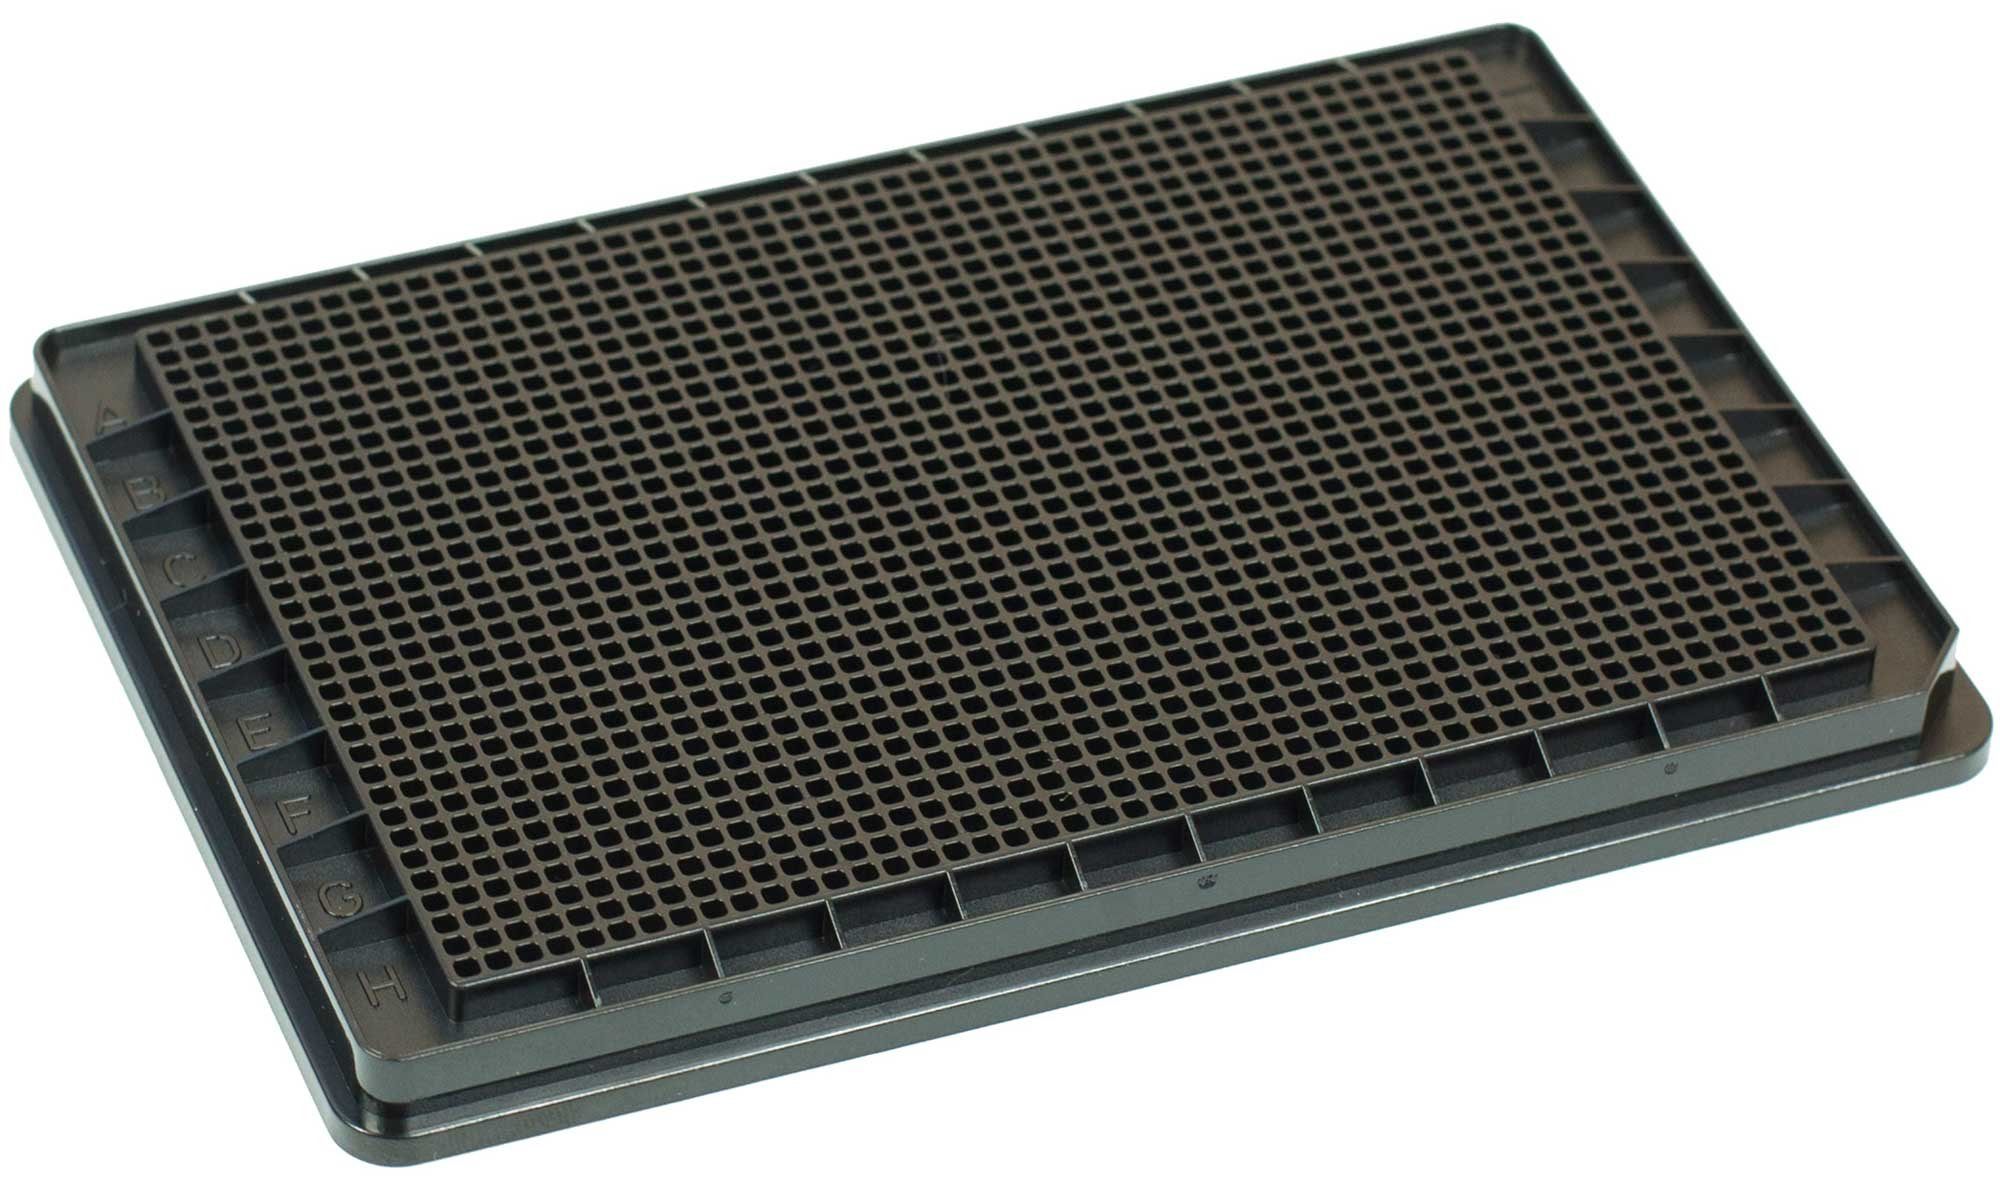 BRANDplates pureGrade Non-Treated Non-Sterile Surface 1536-Well Plate - Black, F-Bottom